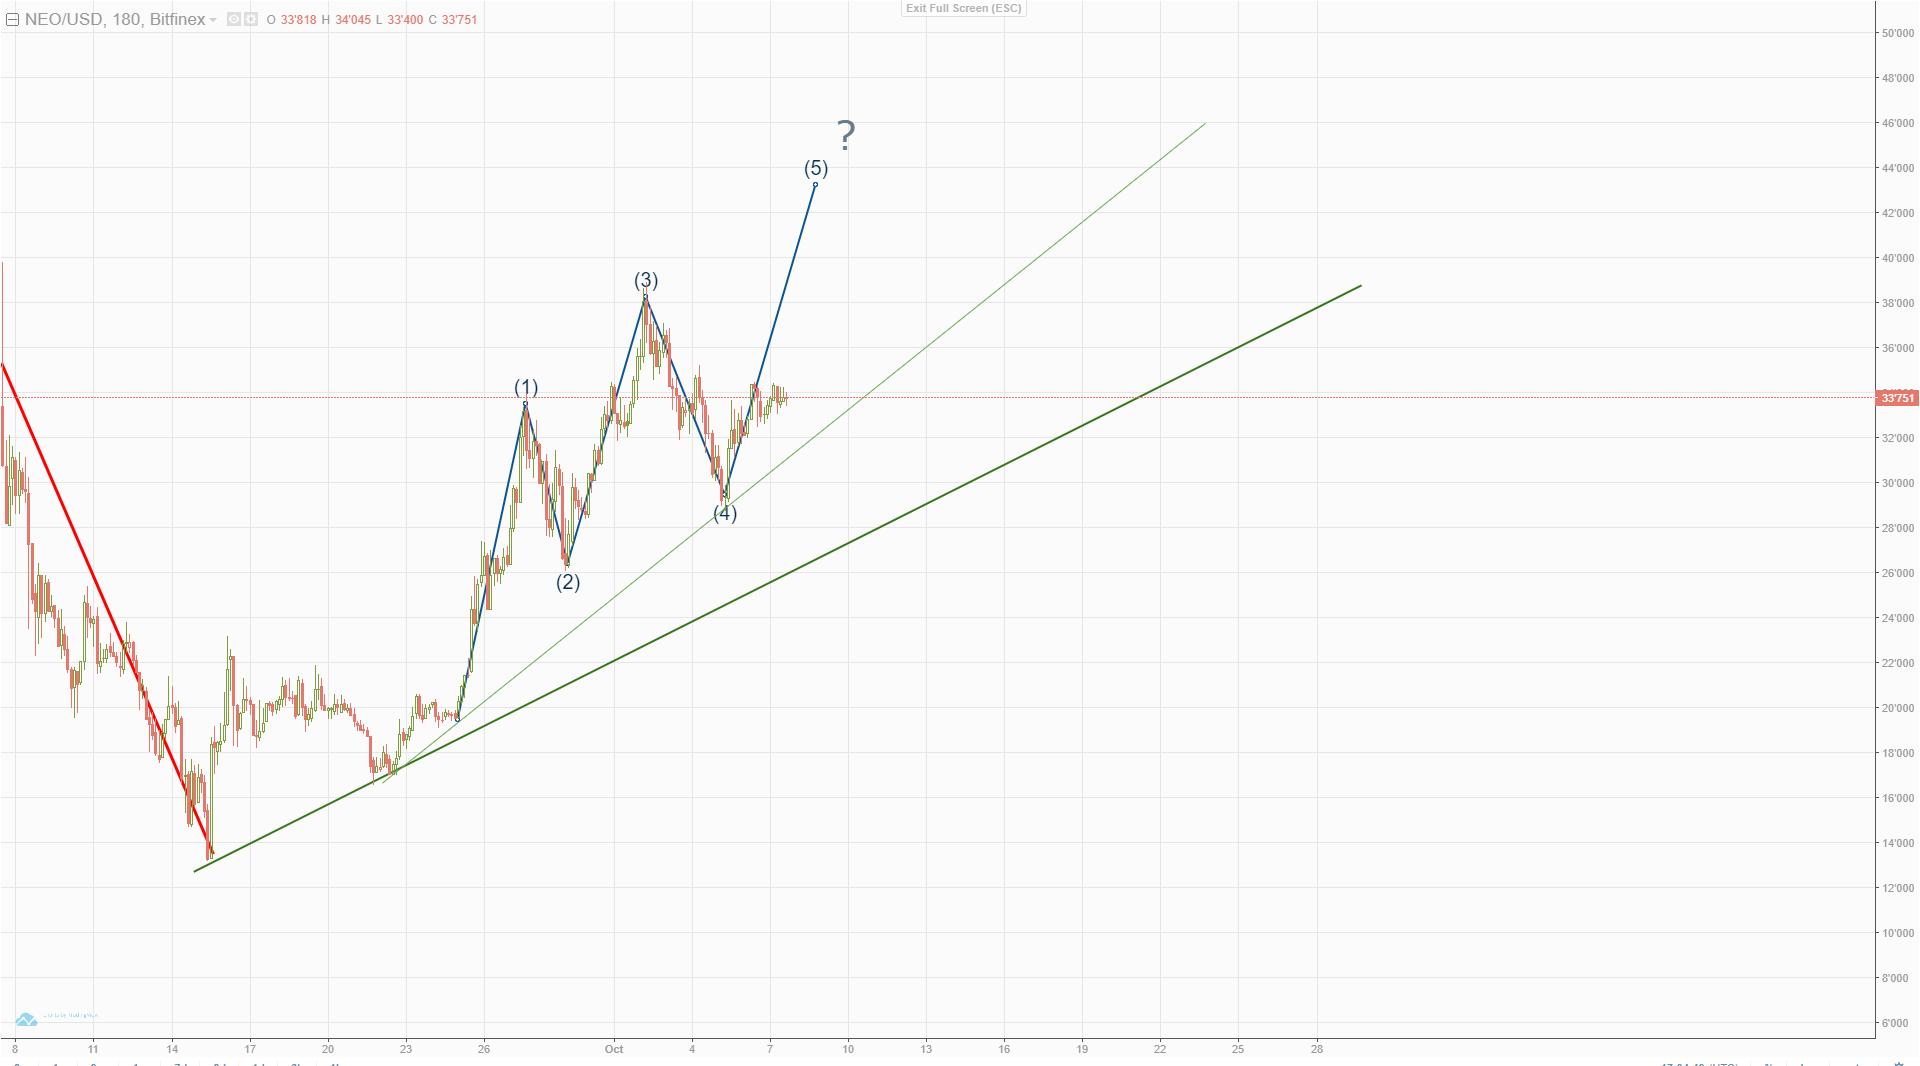 ripple kurs prognose